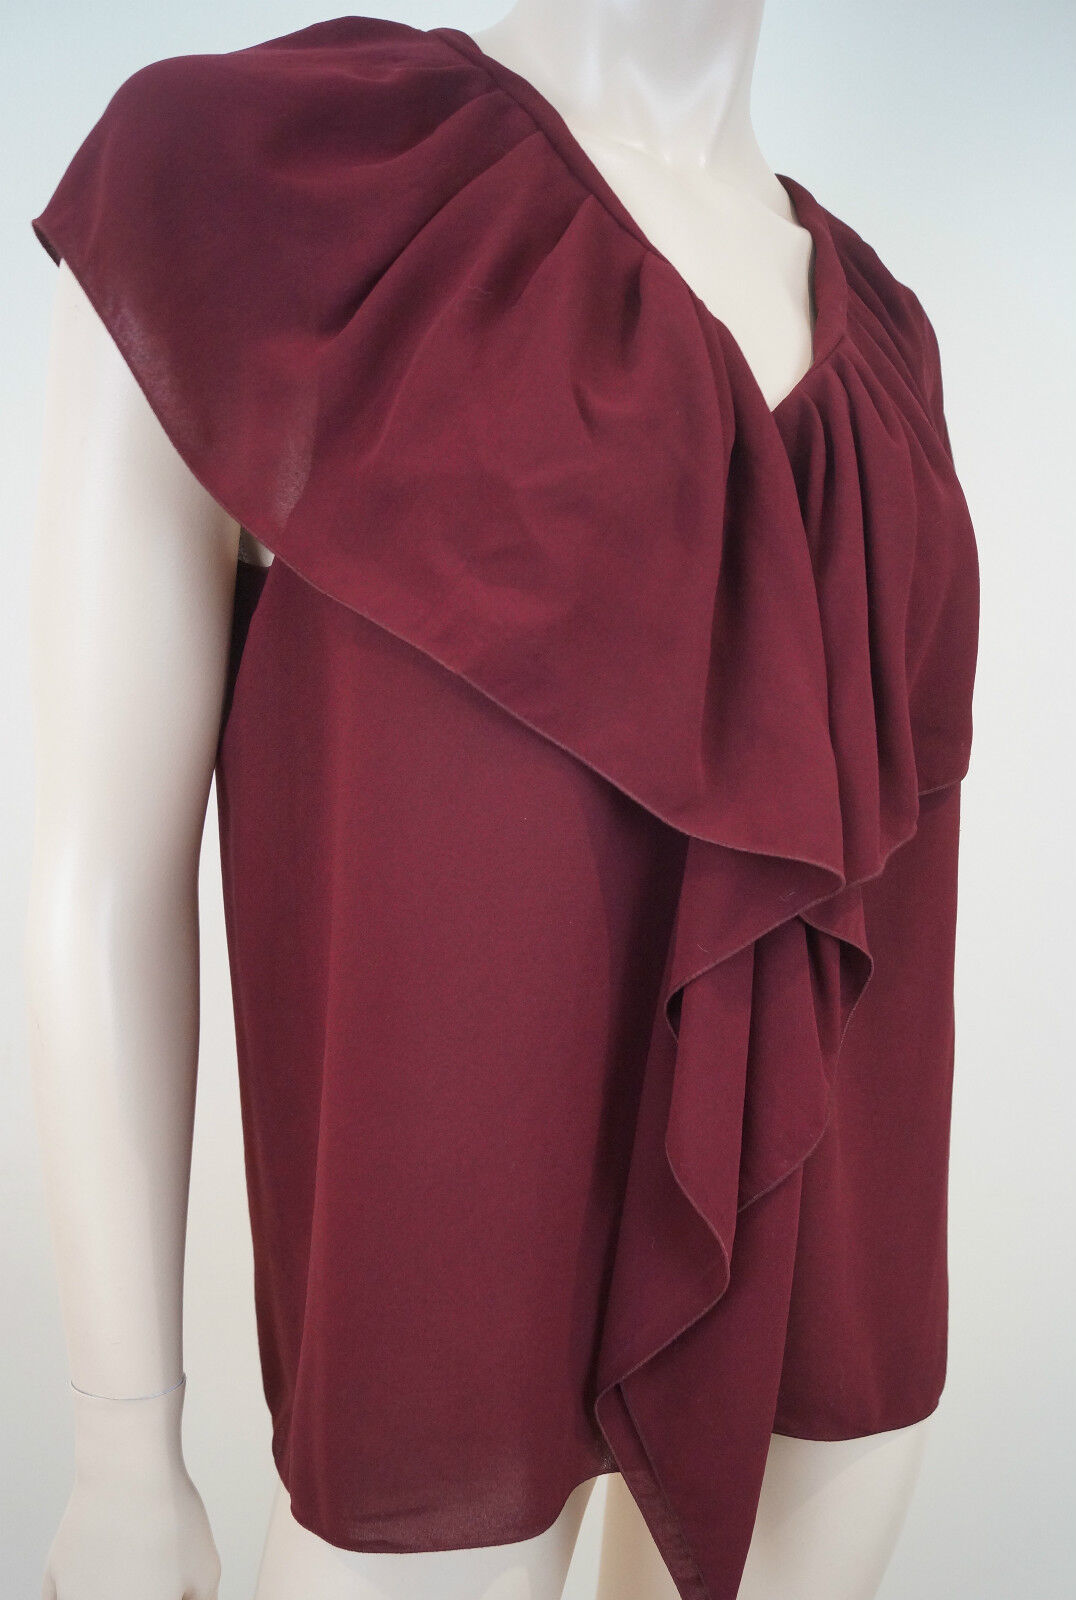 LANVIN PARIS Vintage Burgundy Red Draped Pleat Ruffle Detail Sleeveless Top Sz42